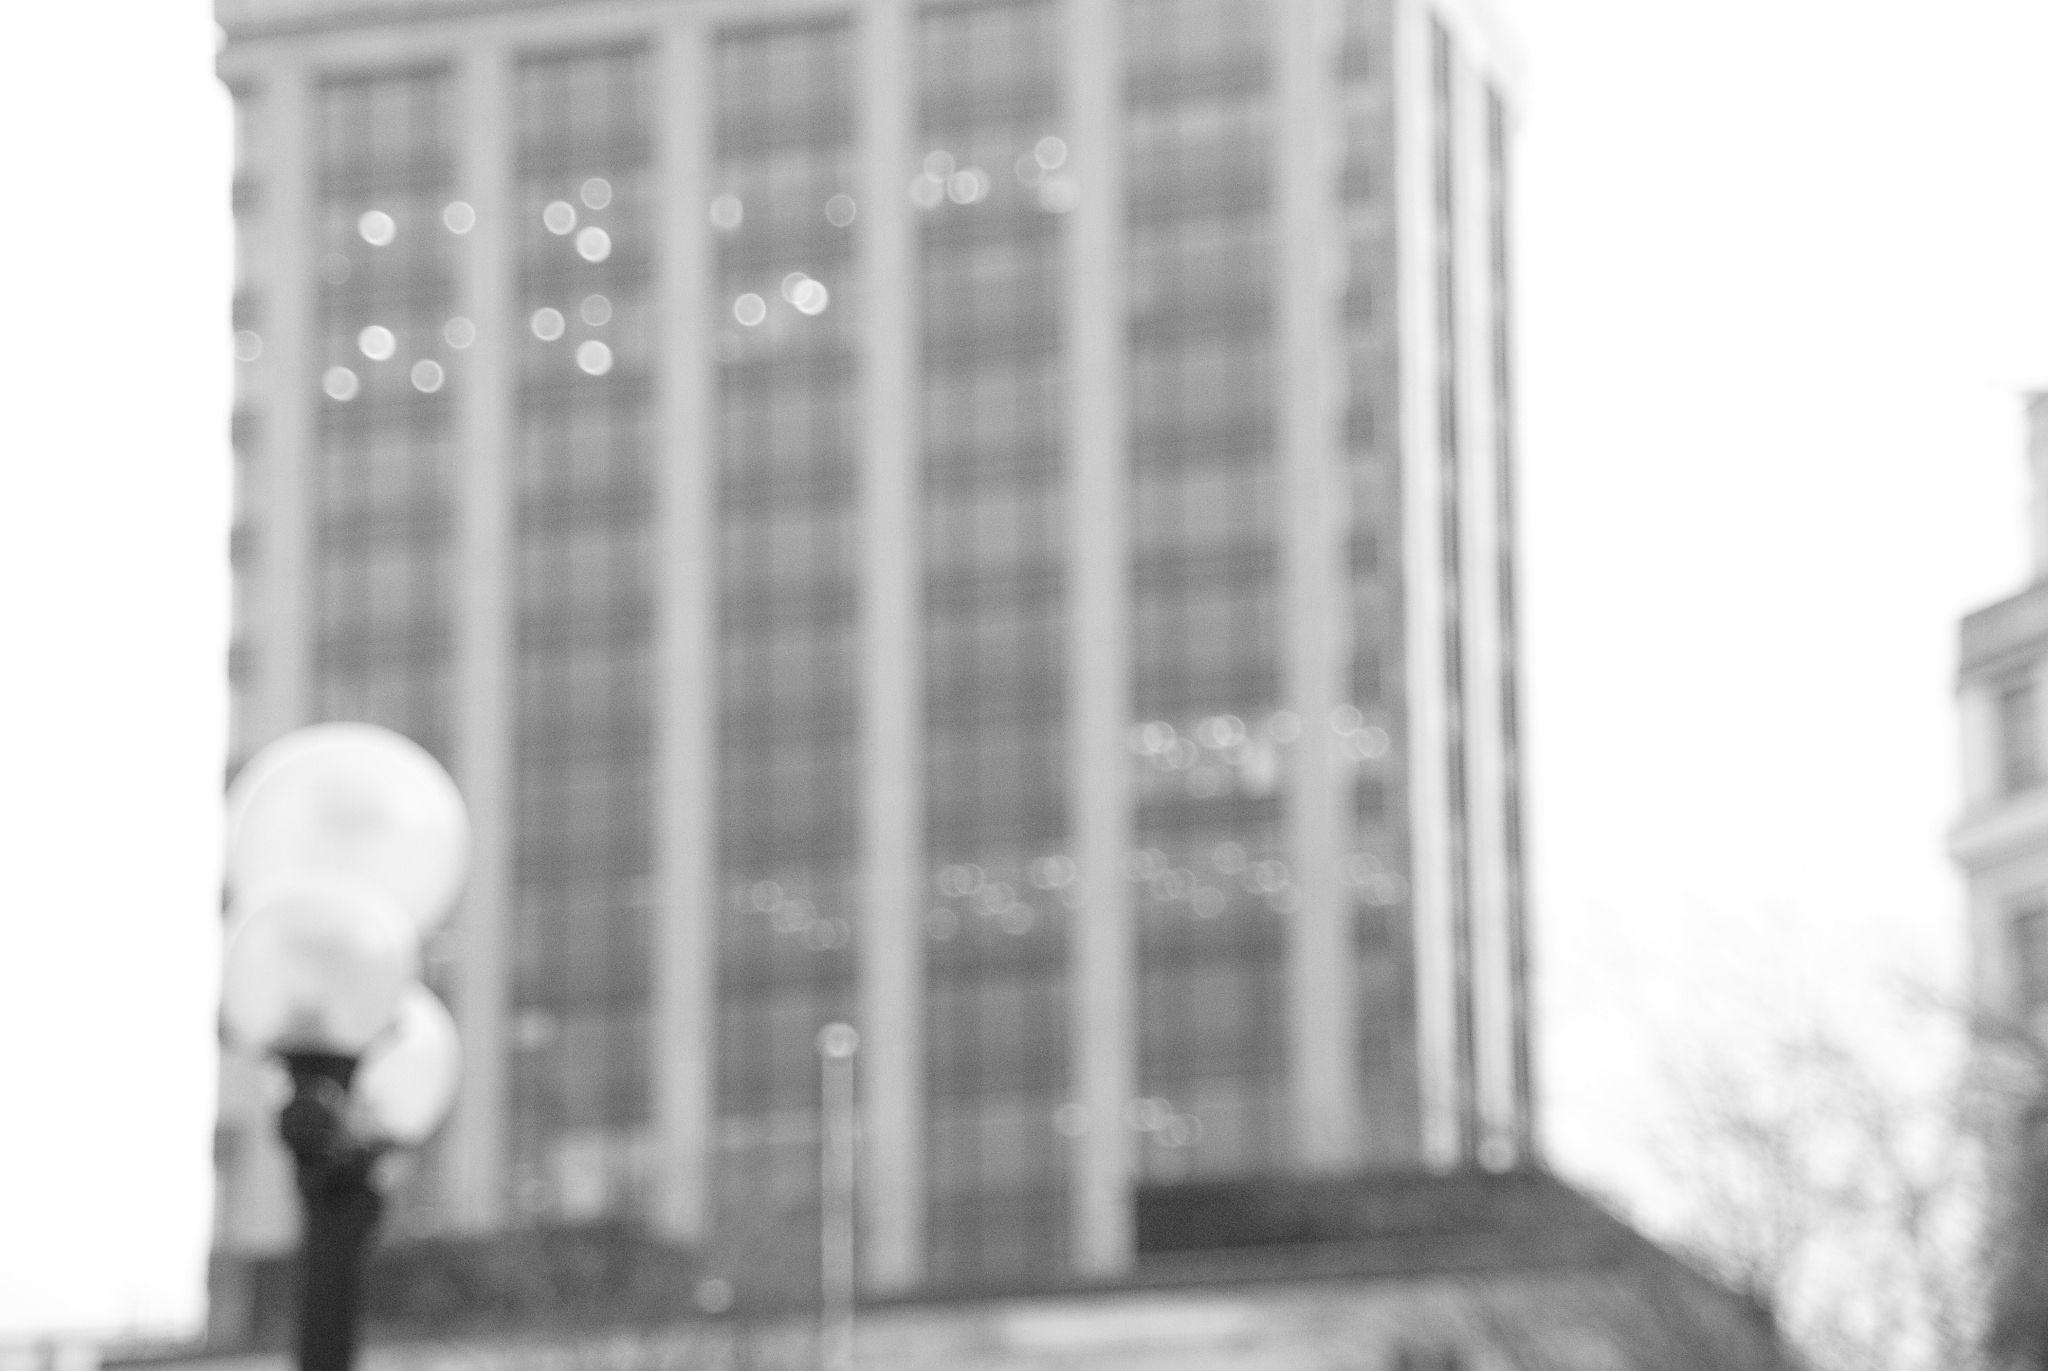 Blurry Buildings 2 by Callum Joel Richards on 500px